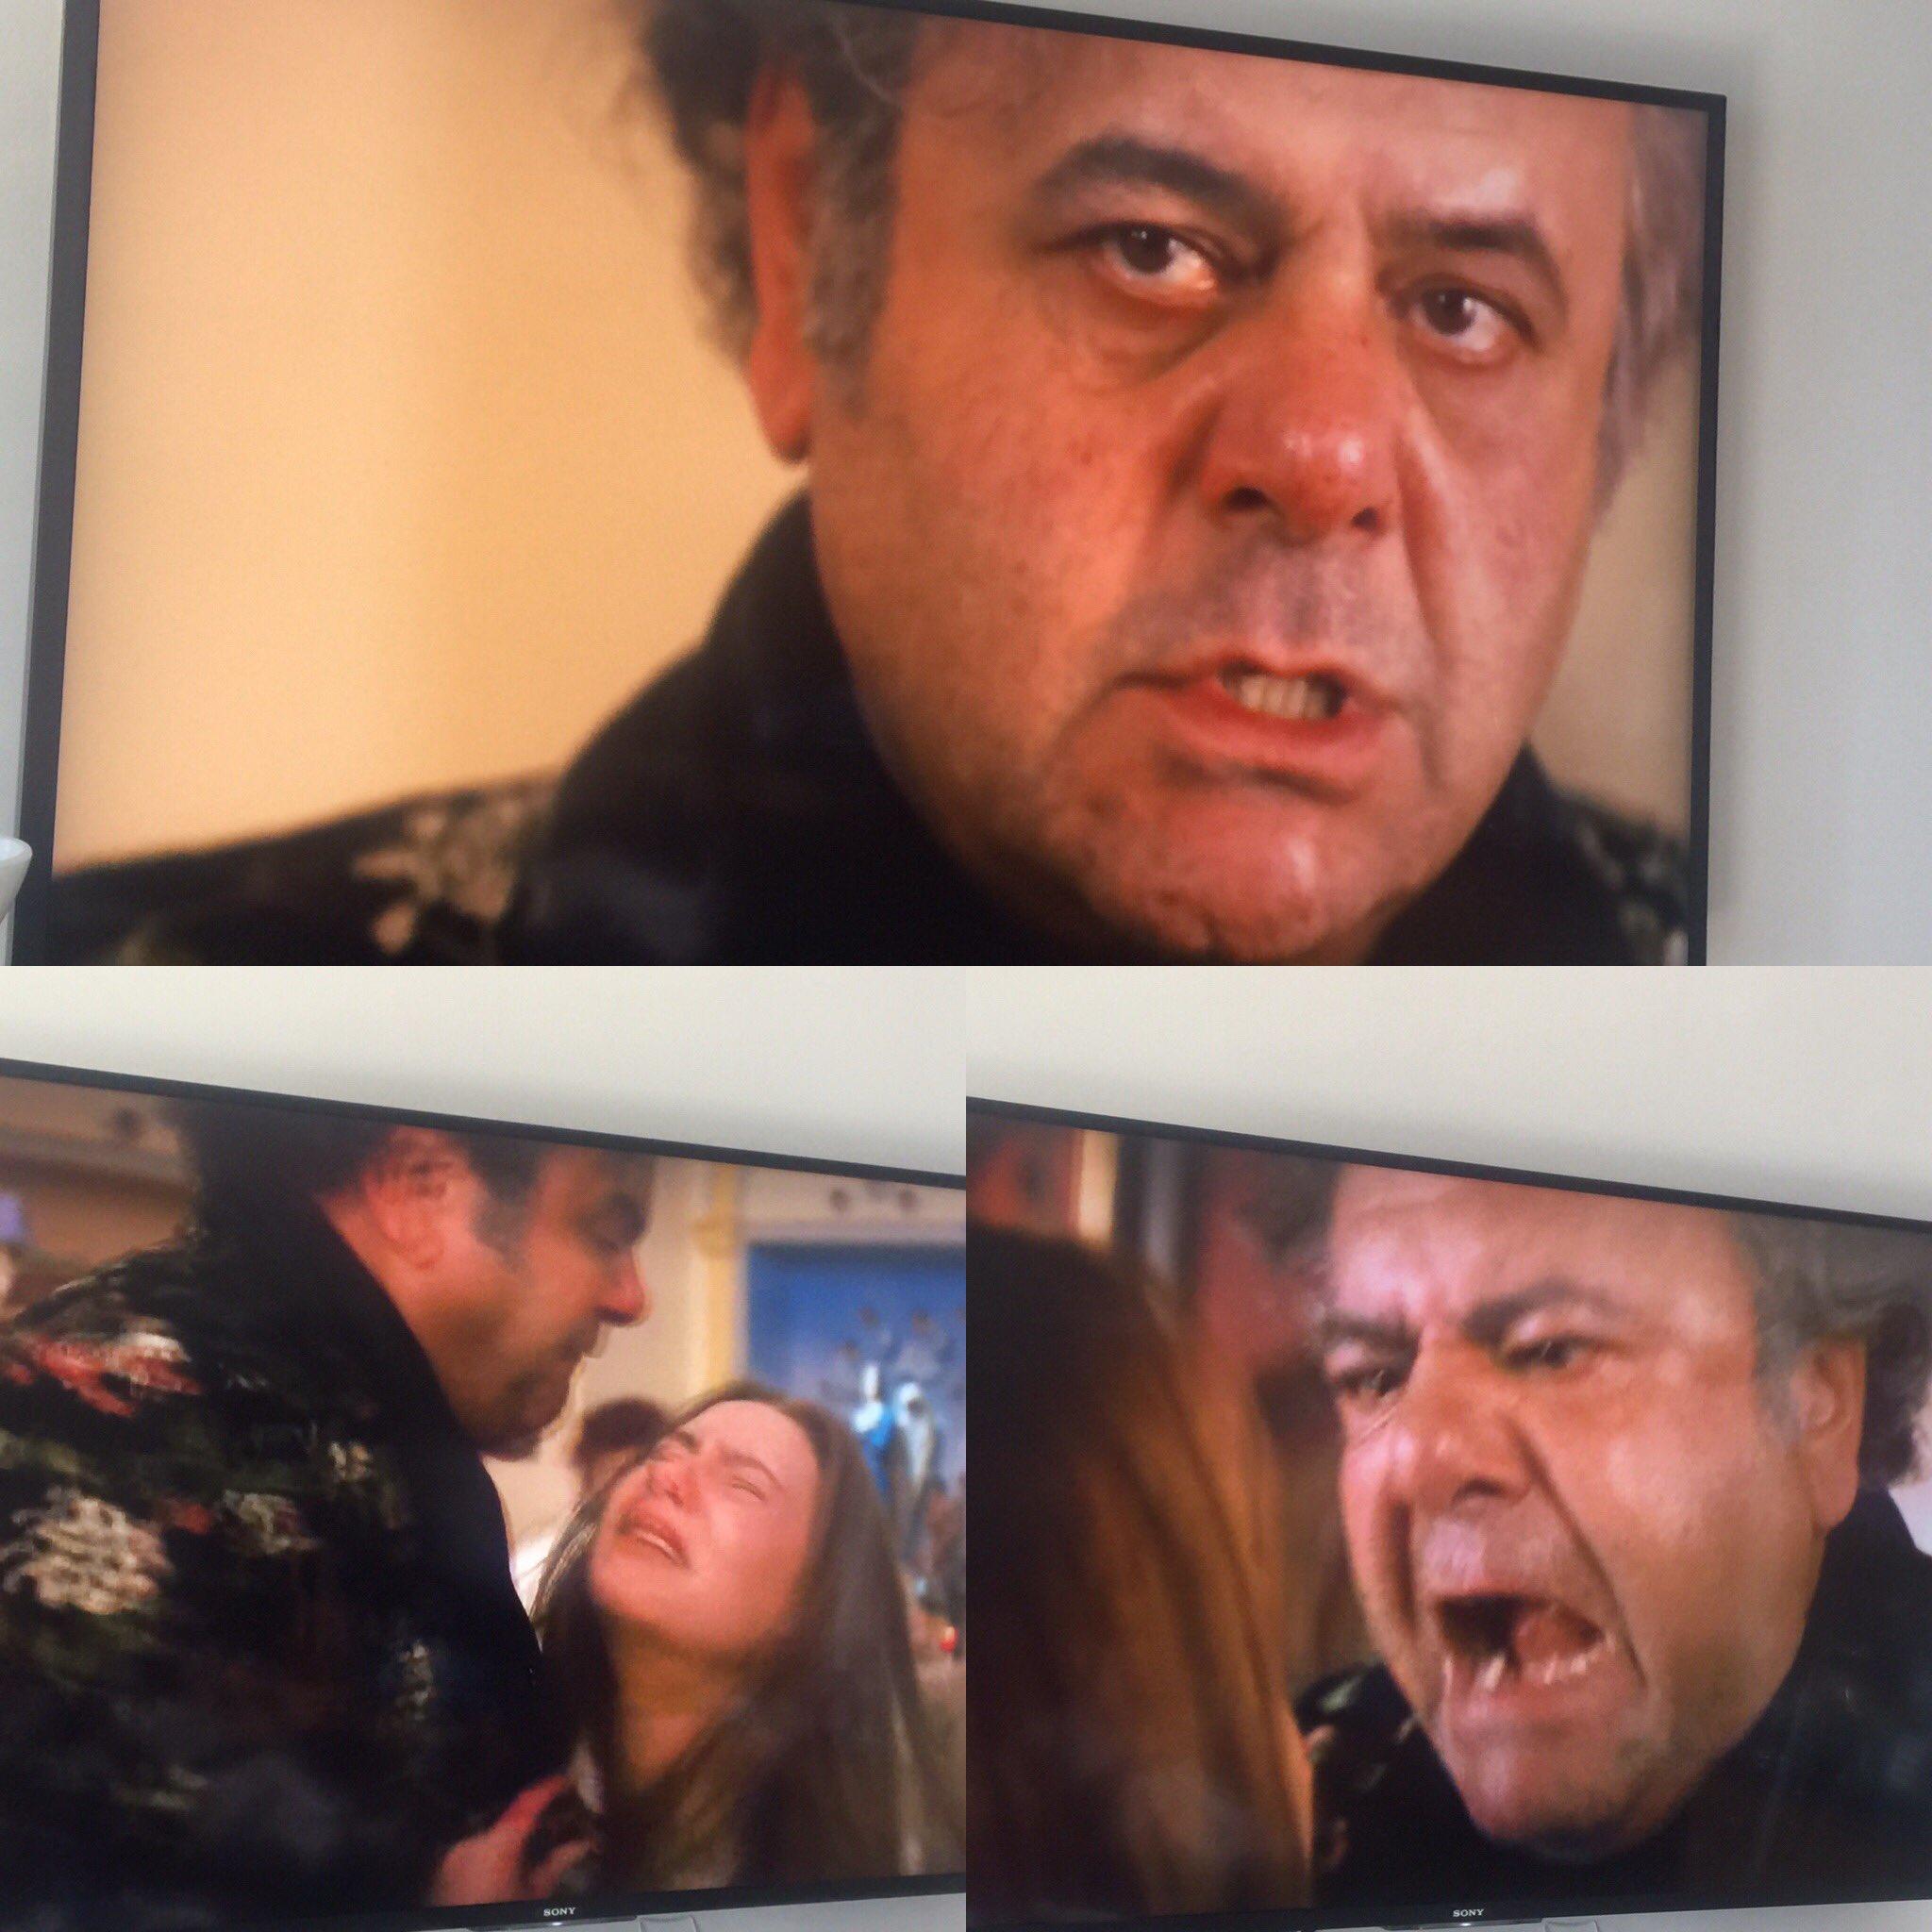 "Dee Dee Sorvino on Twitter: ""Look who is on TV! Lord ..."